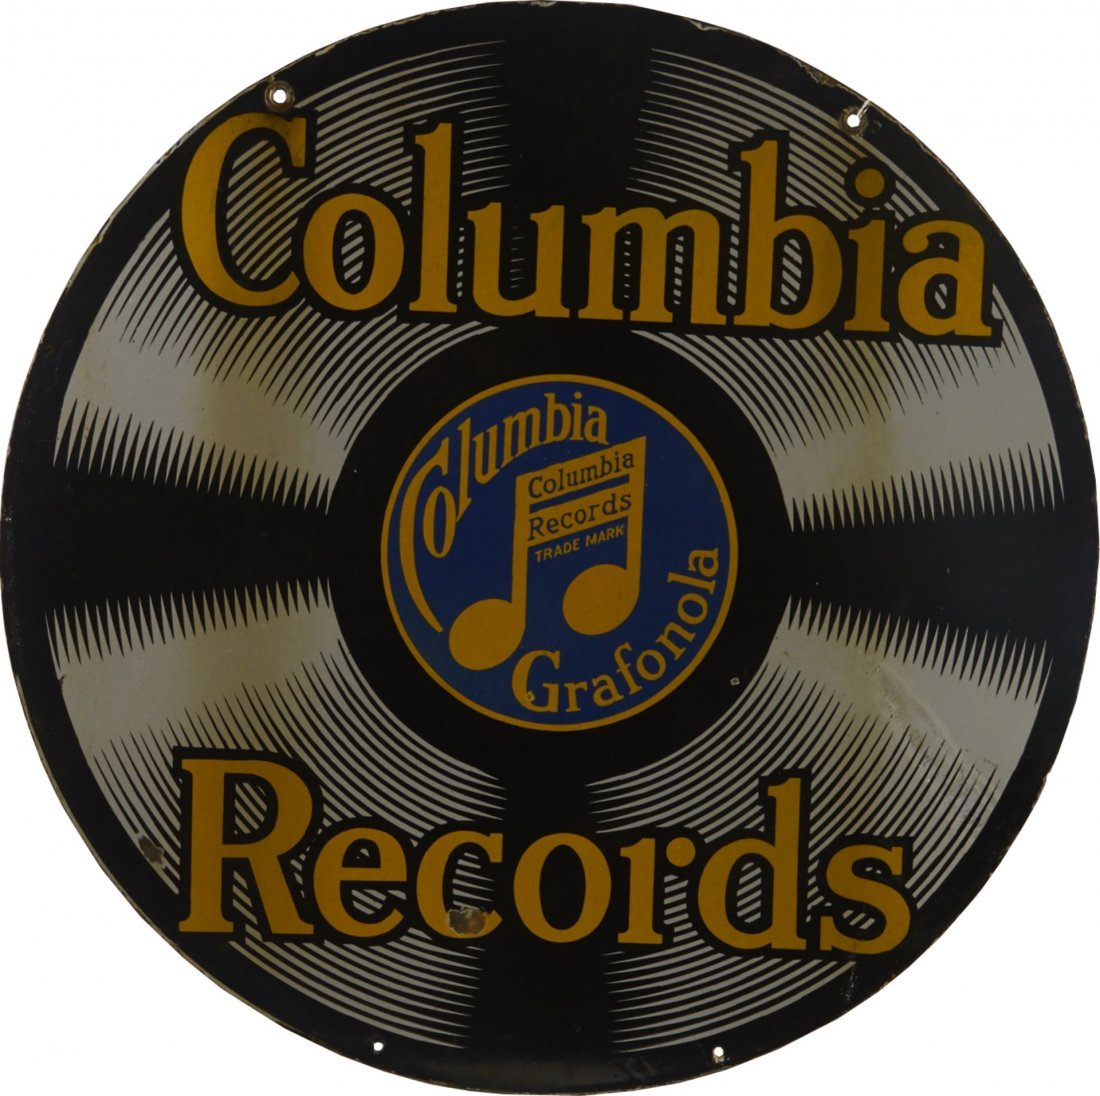 Original Columbia Records Round Porcelain Sign